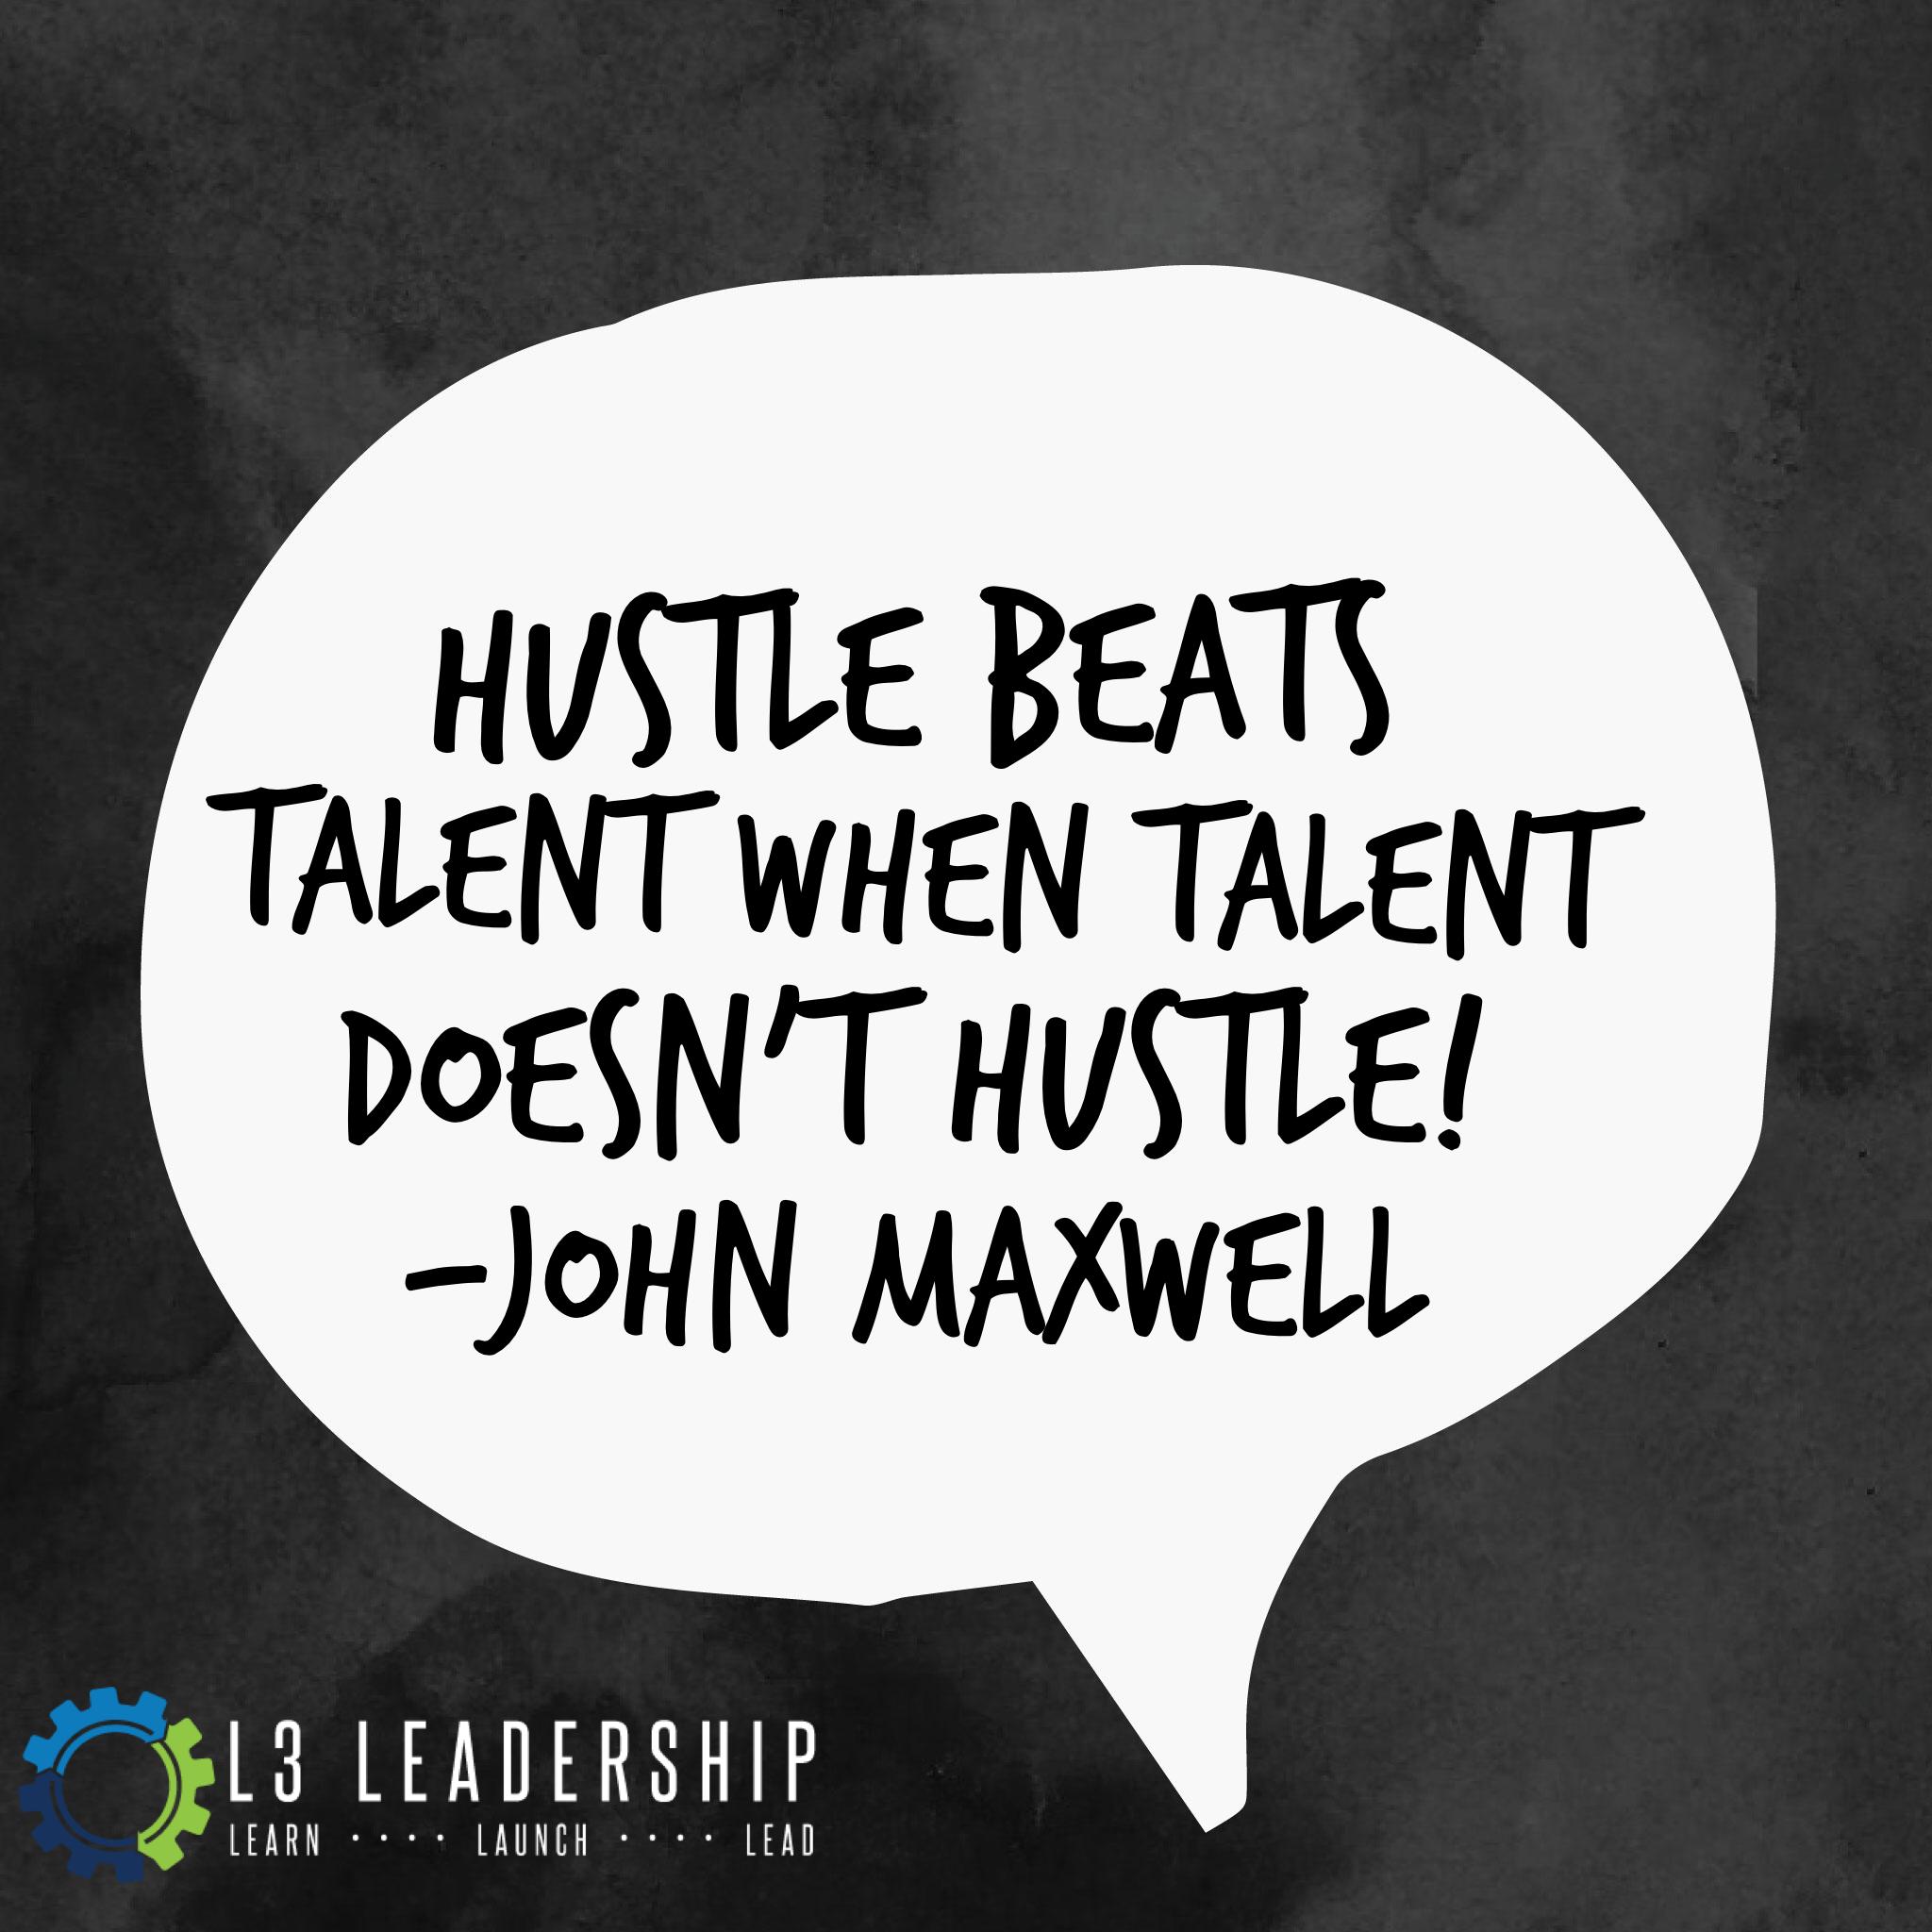 Hustle Beats Talent When Talent Doesnt Hustle John Maxwell